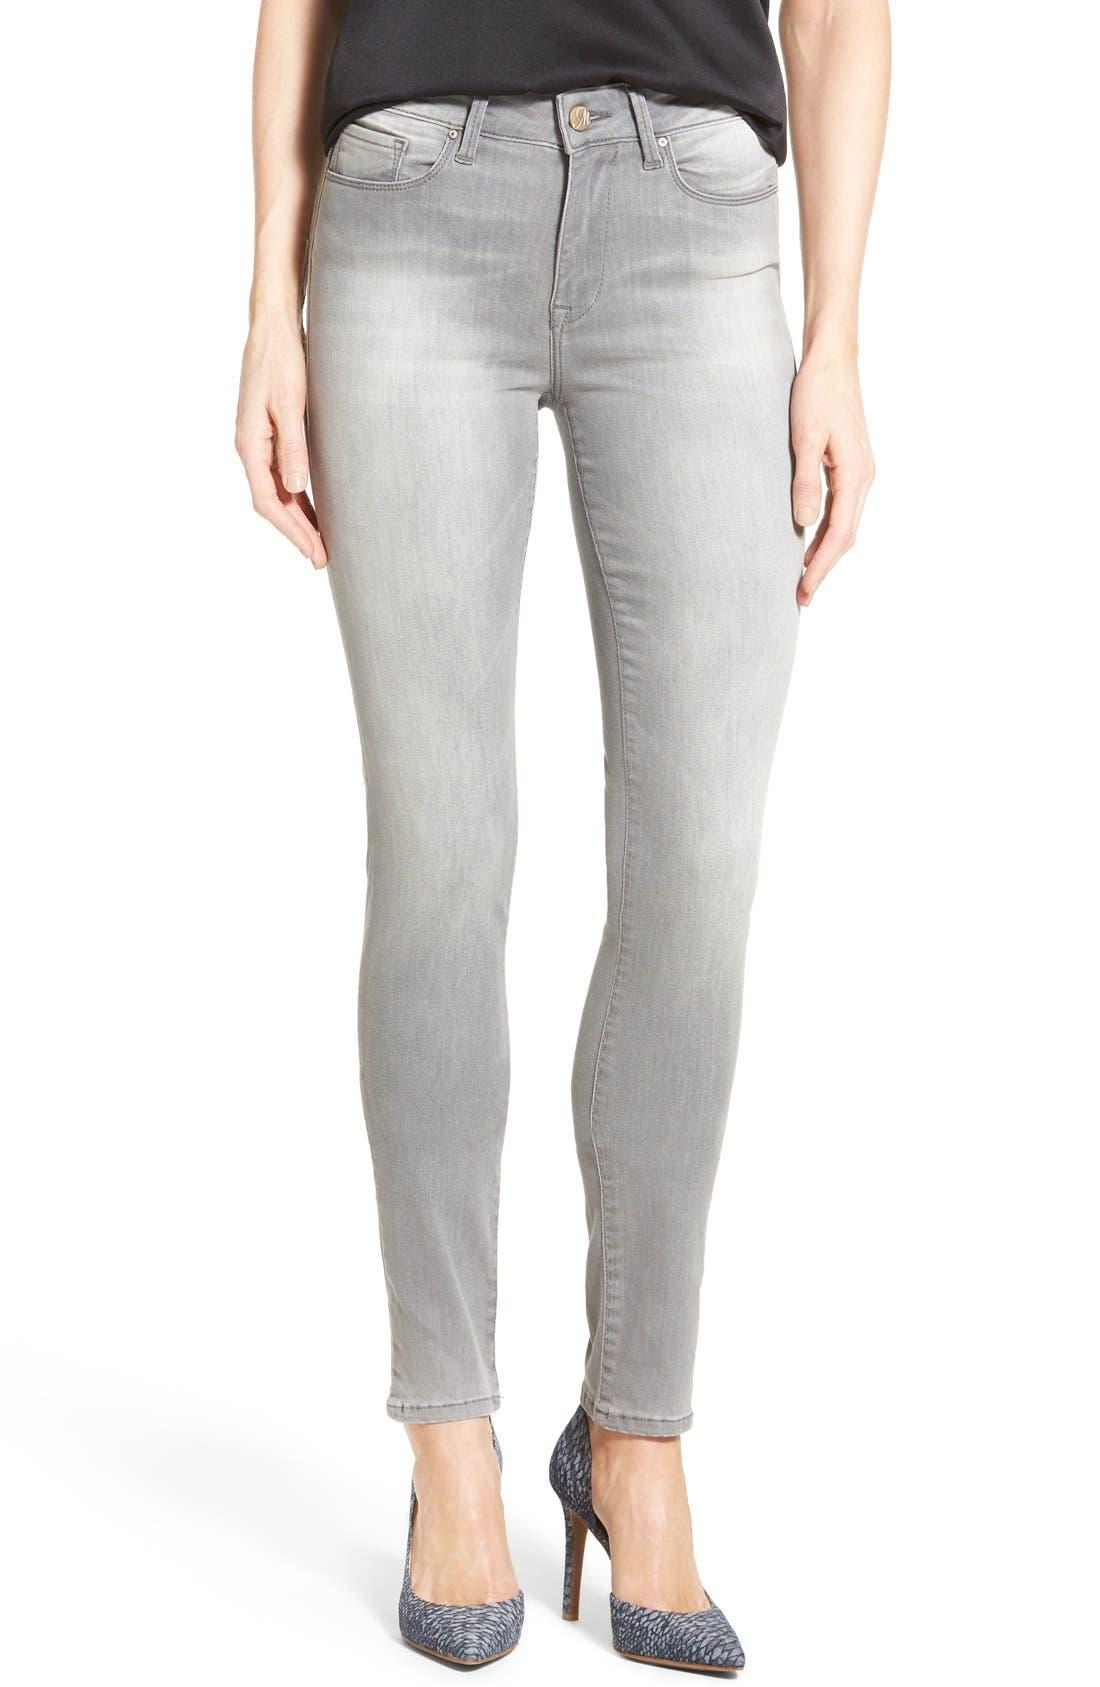 'Alissa' Stretch Skinny Jeans,                         Main,                         color, Alissa Light Grey Tribeca